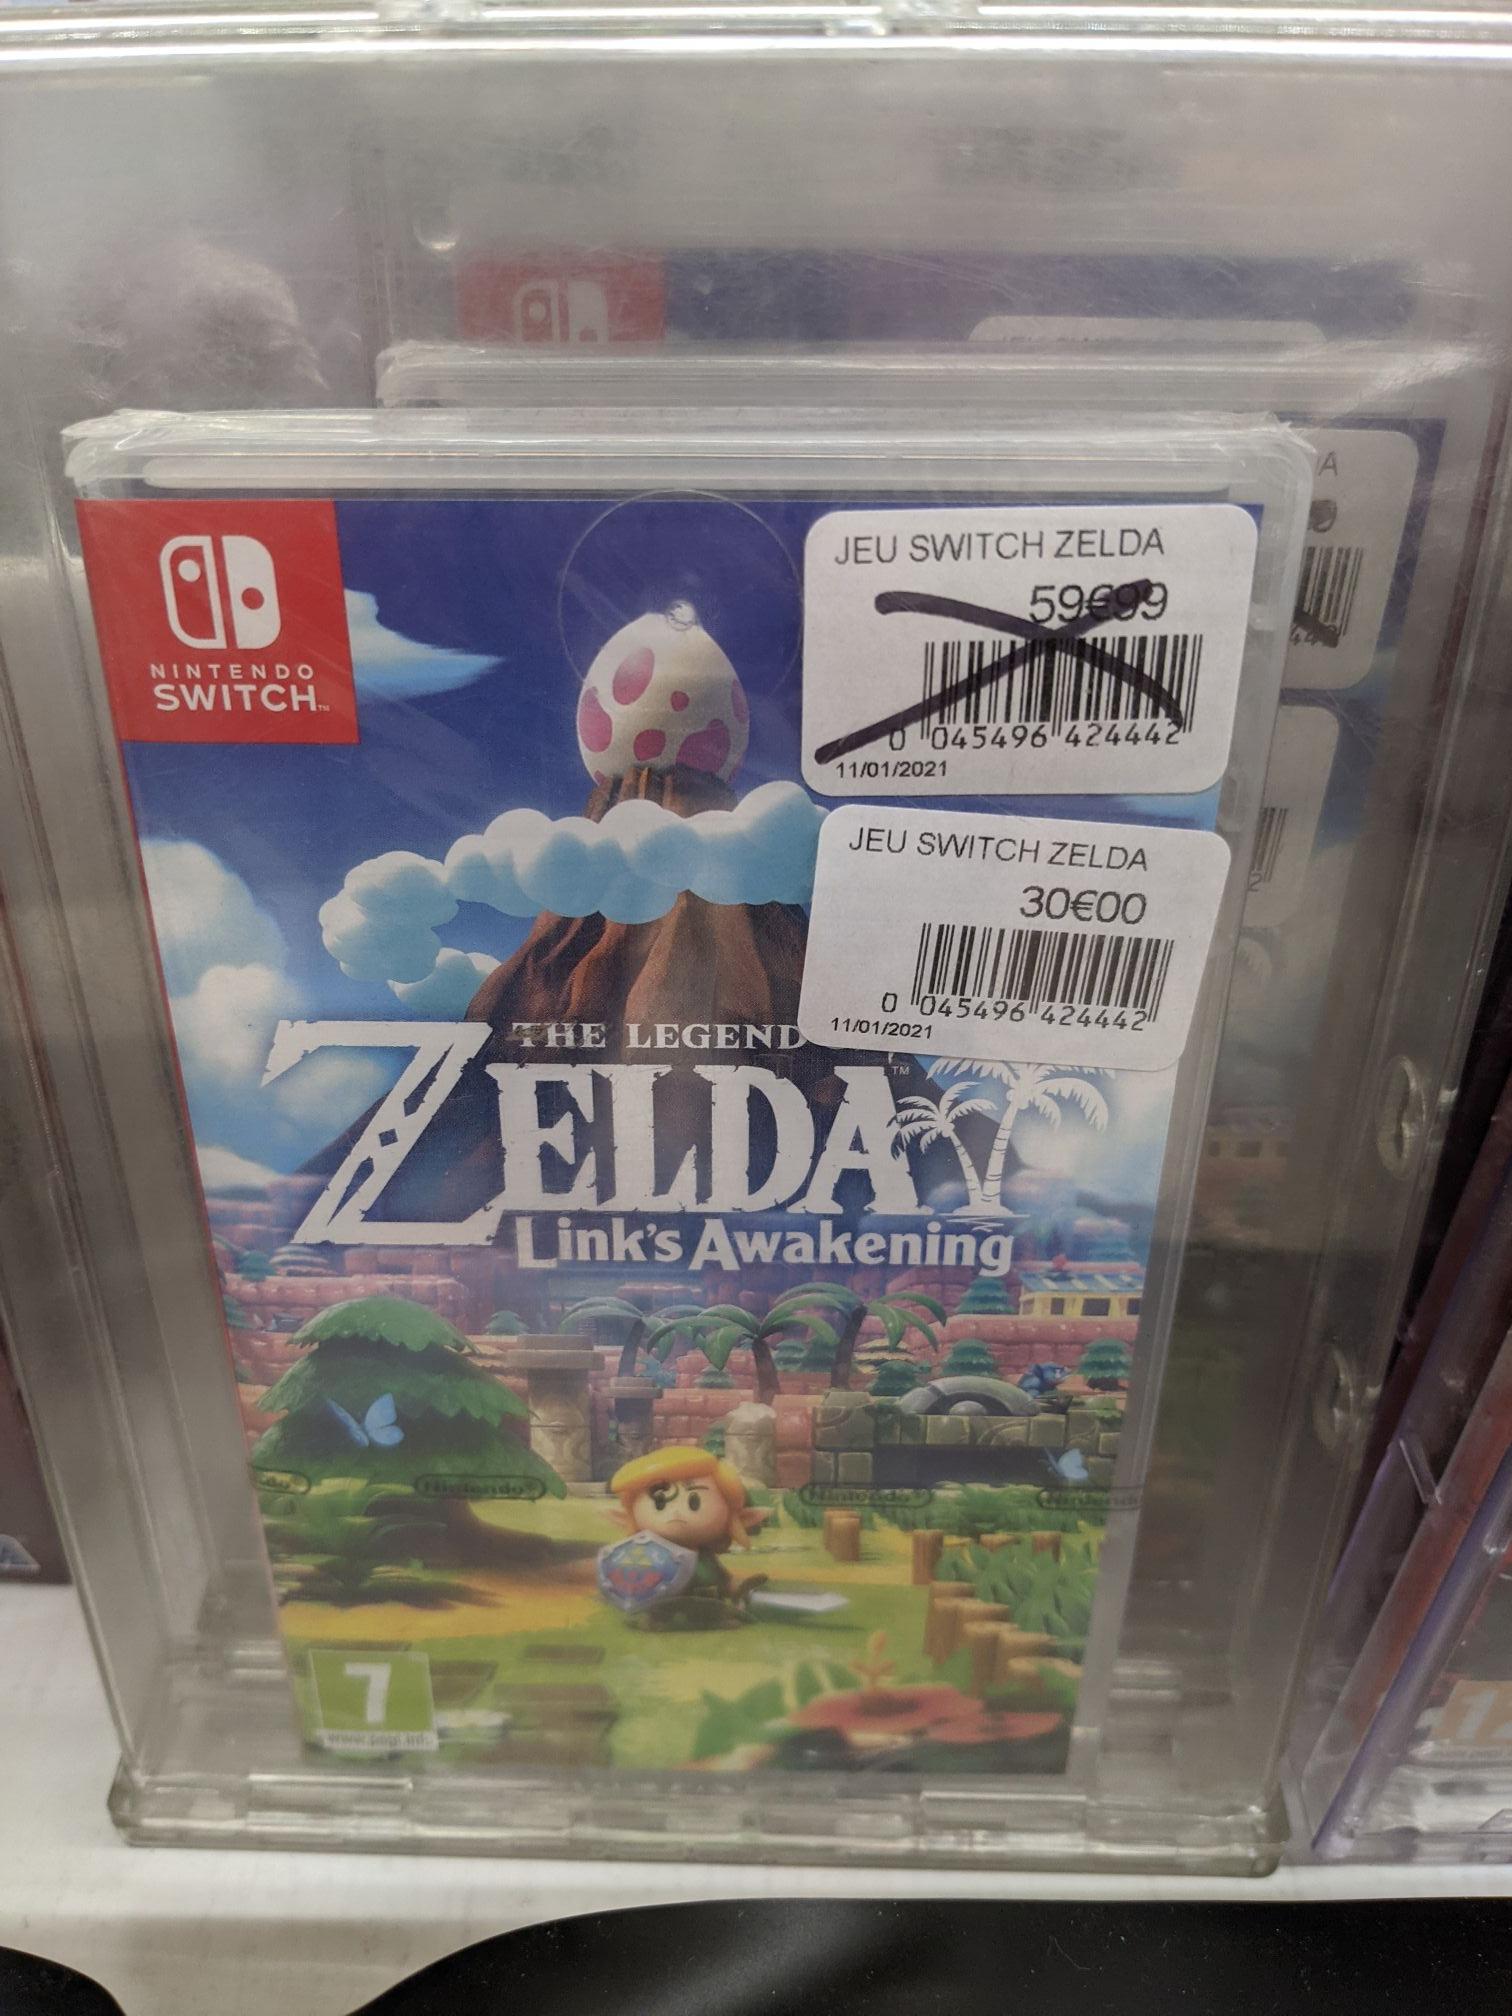 The Legend of Zelda : Link's Awakening sur Nintendo Switch - Lens (62), Saint-Quentin (02), Pacé (35)